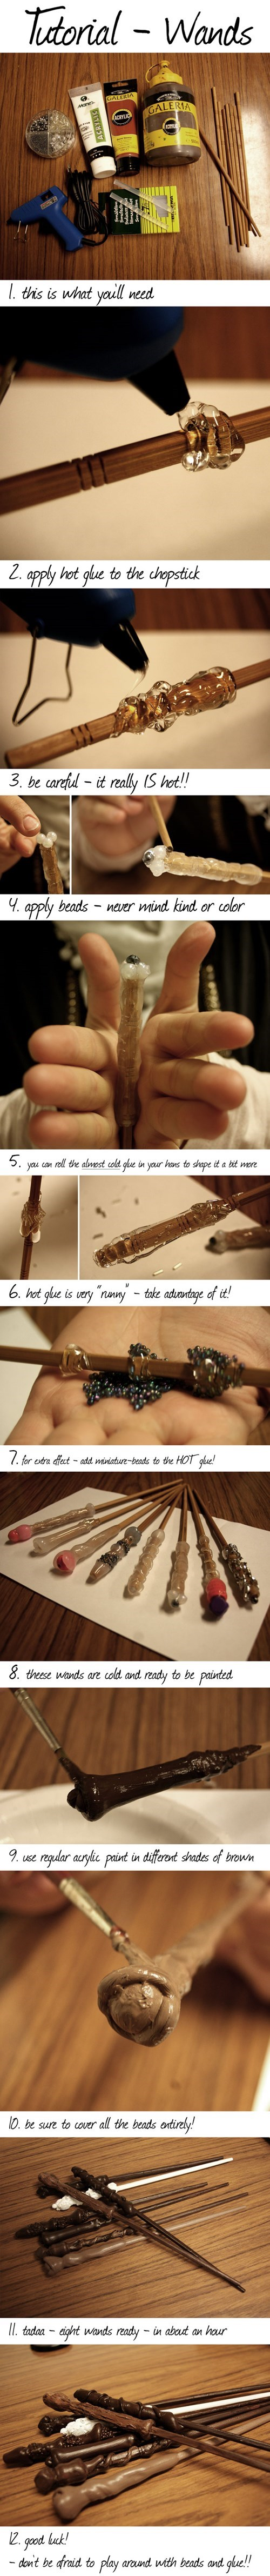 DIY Harry Potter wands - 7948717824